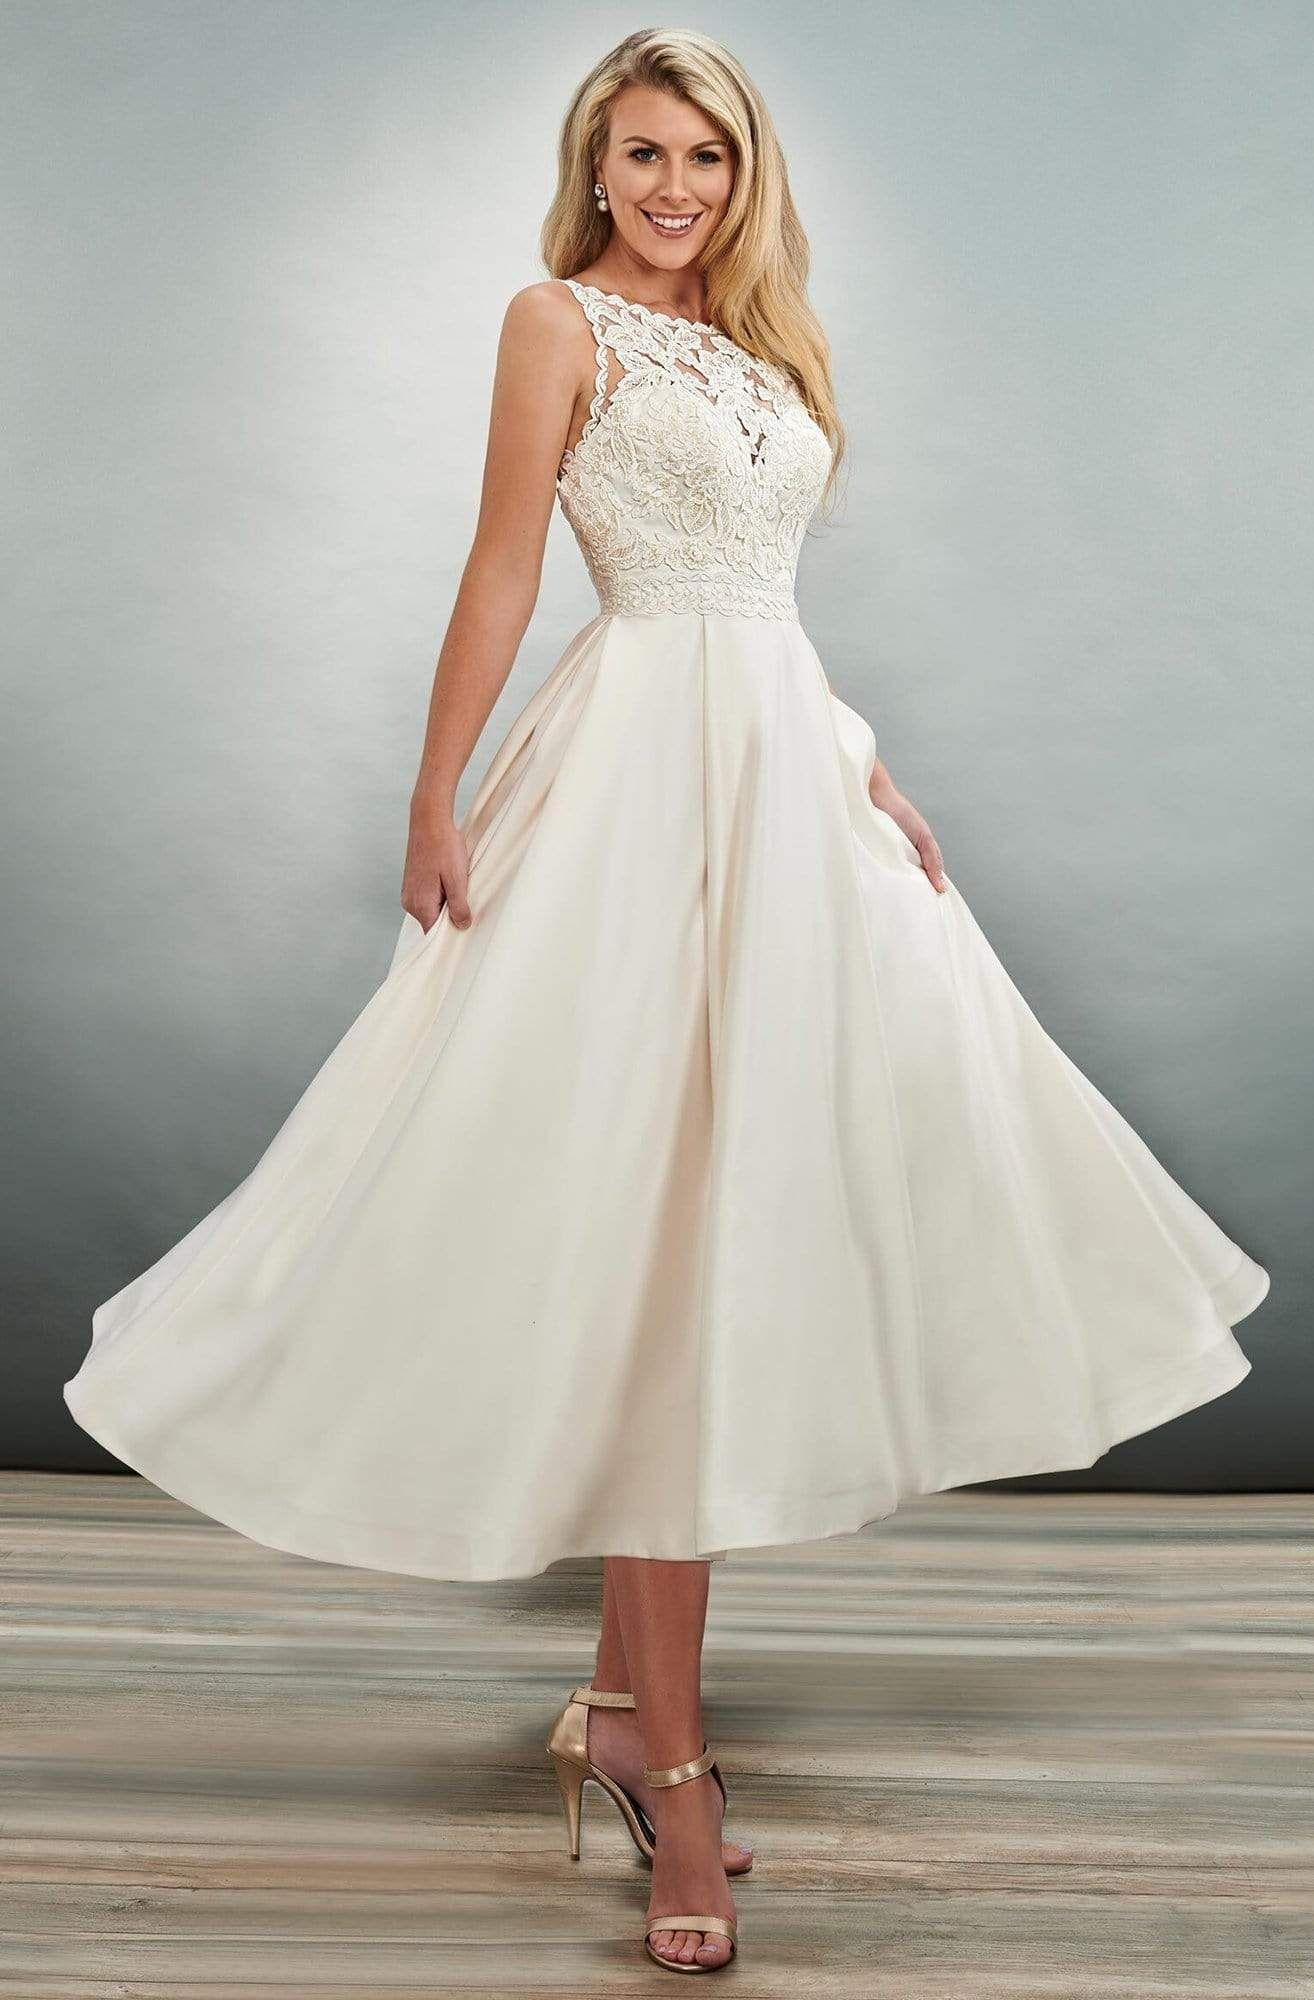 Mary S Bridal Mb2079 Bateau Embroidery Tea Length Dress Tea Length Wedding Dress Vintage Tea Length Wedding Dress Wedding Dress For Short Women [ 2000 x 1314 Pixel ]